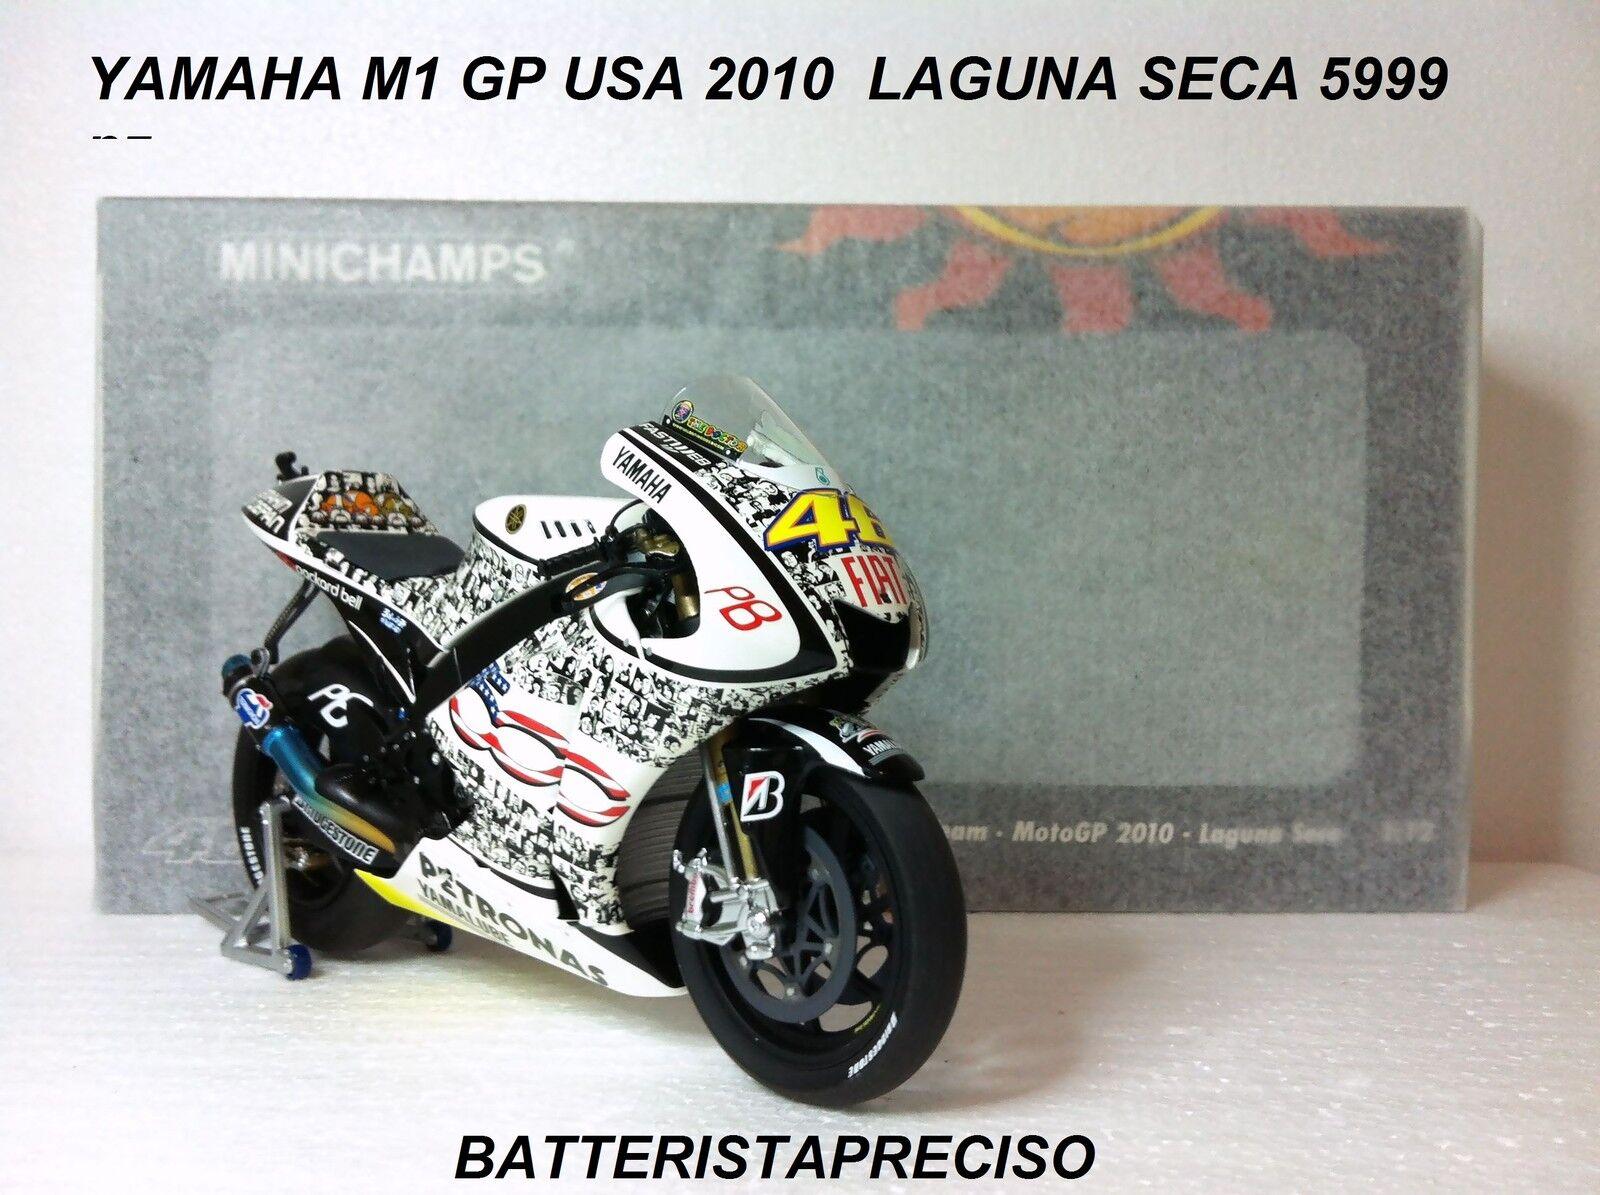 MINICHAMPS VALENTINO ROSSI 1 12 YAMAHA 2010 GP USA LAGUNA SECA L.E. 5999 pcs